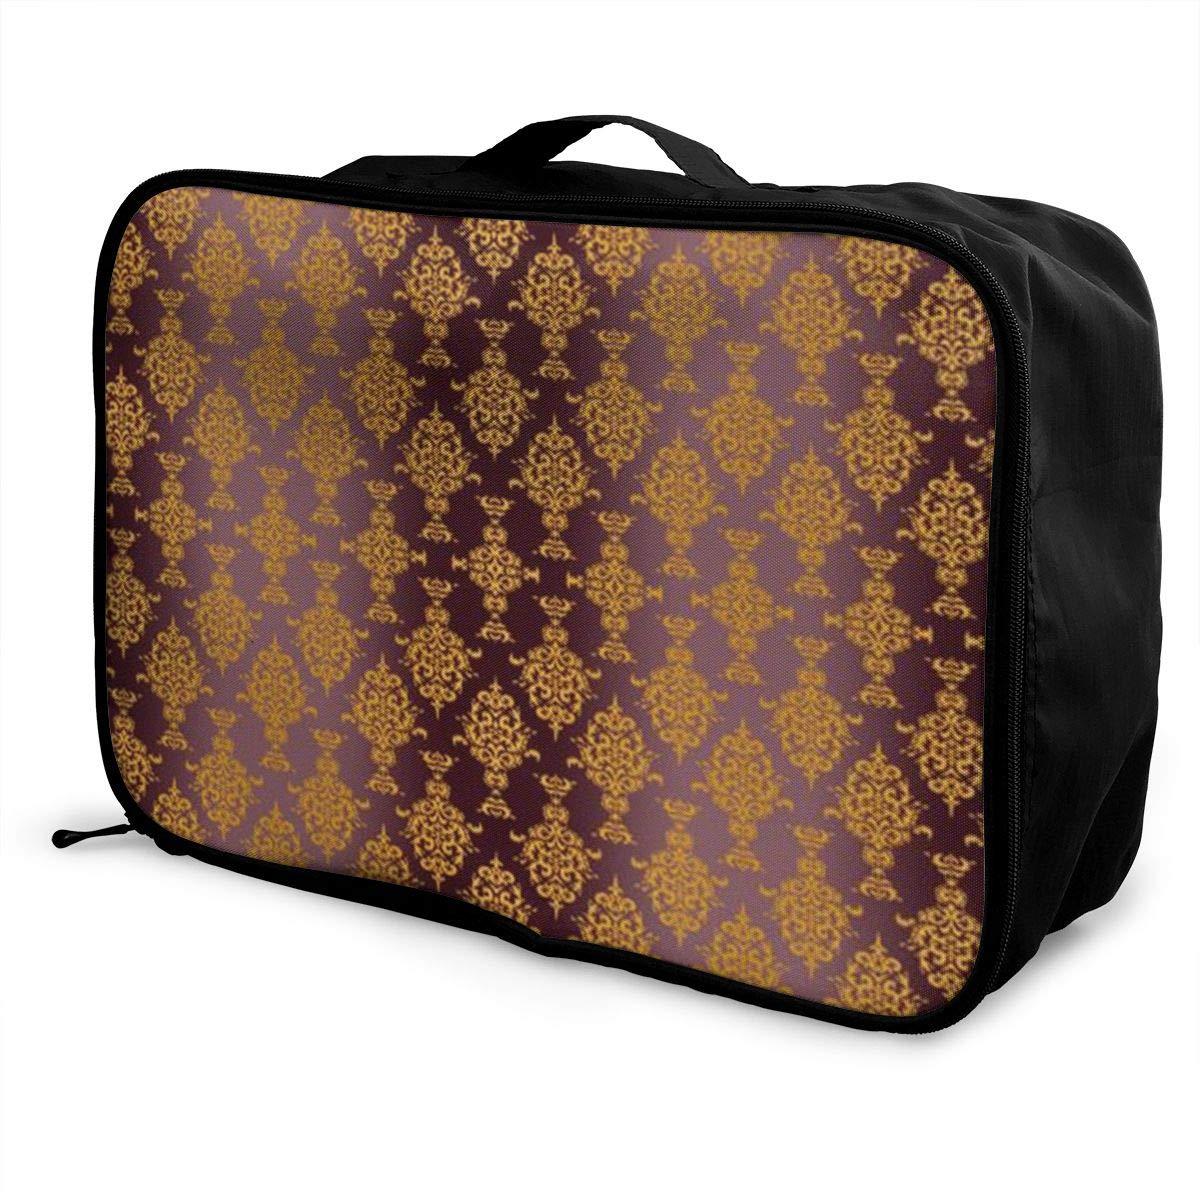 ADGAI Damask Gold Canvas Travel Weekender Bag,Fashion Custom Lightweight Large Capacity Portable Luggage Bag,Suitcase Trolley Bag